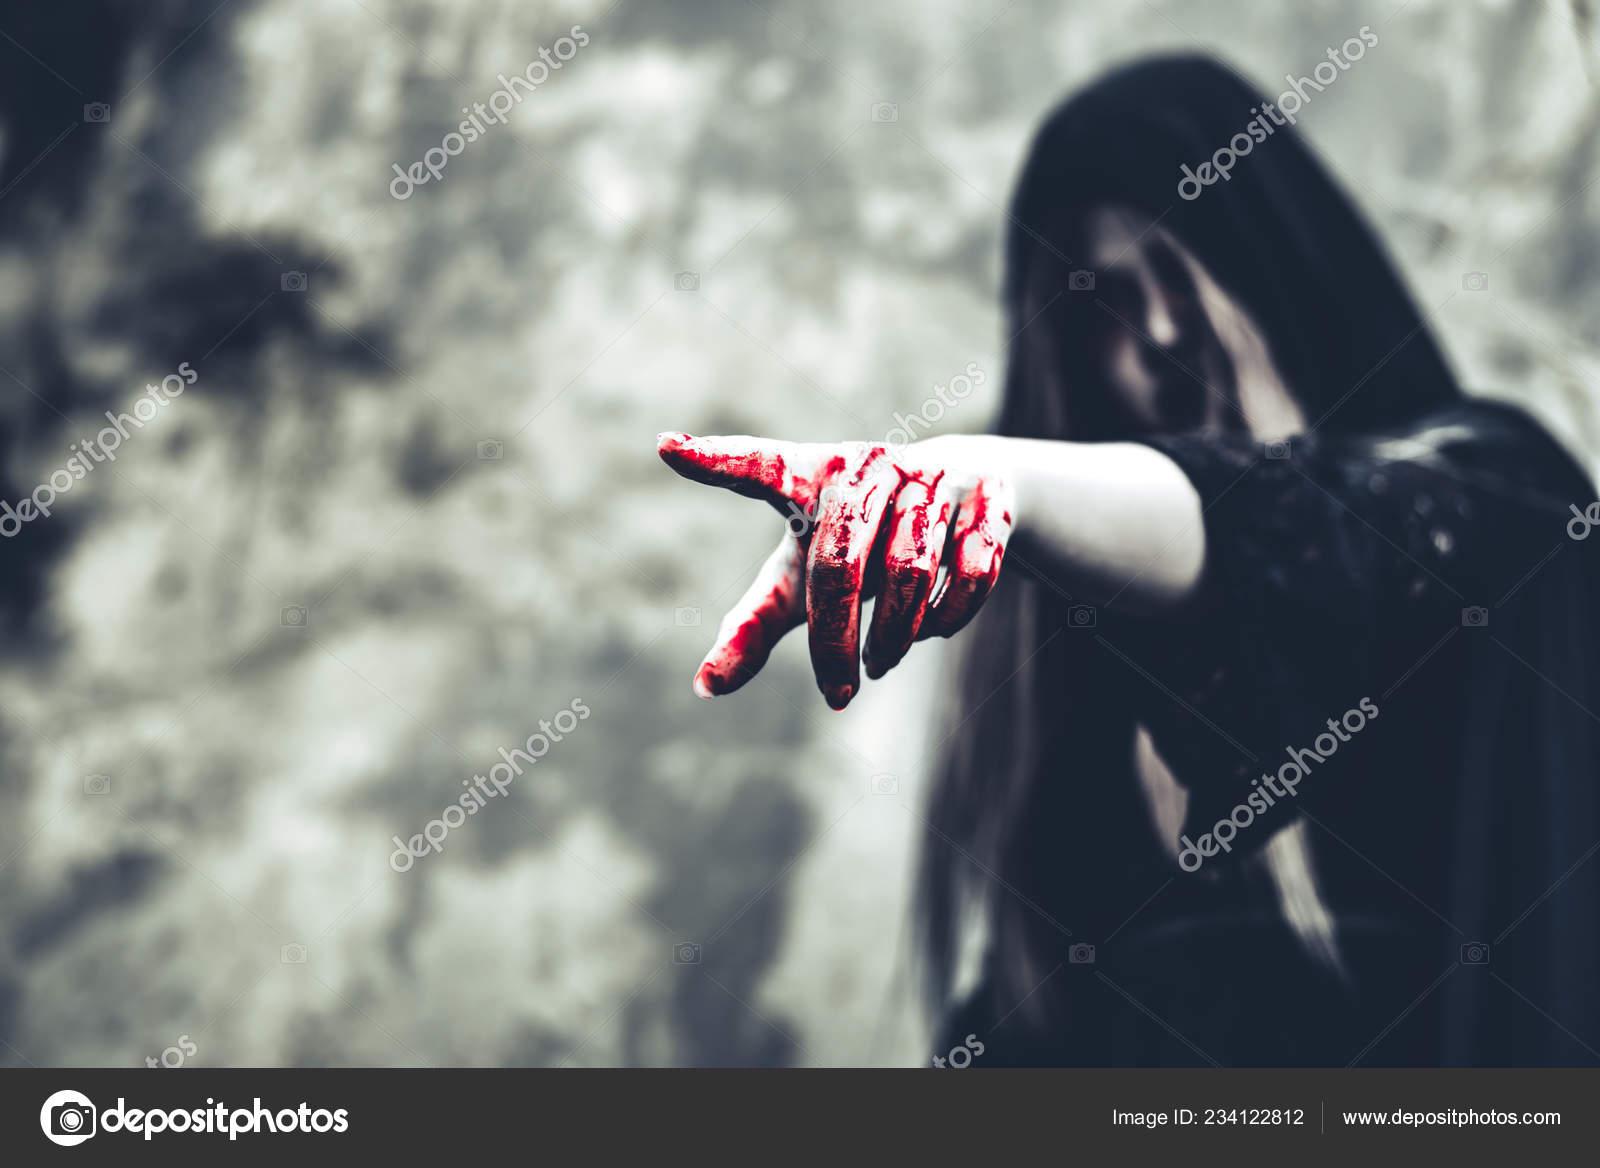 depositphotos_234122812-stock-photo-close-bloody-ghost-hand-pointing.jpg